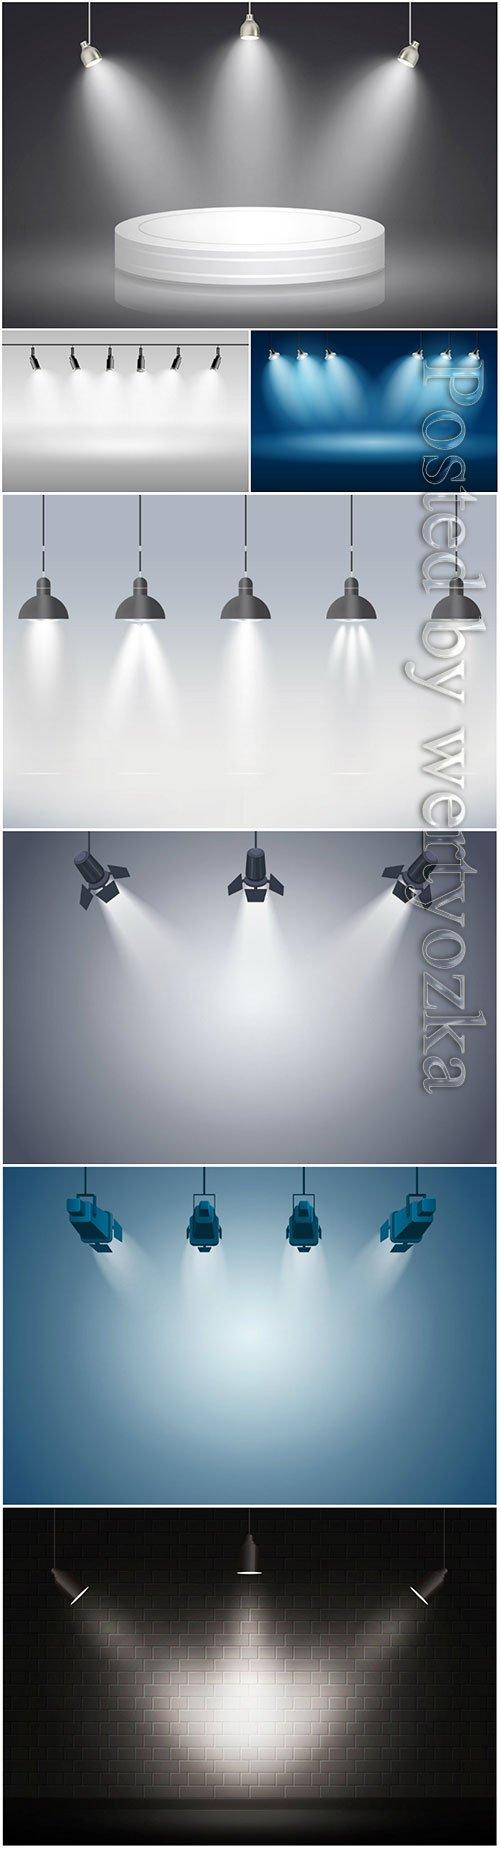 Spotlights vector background